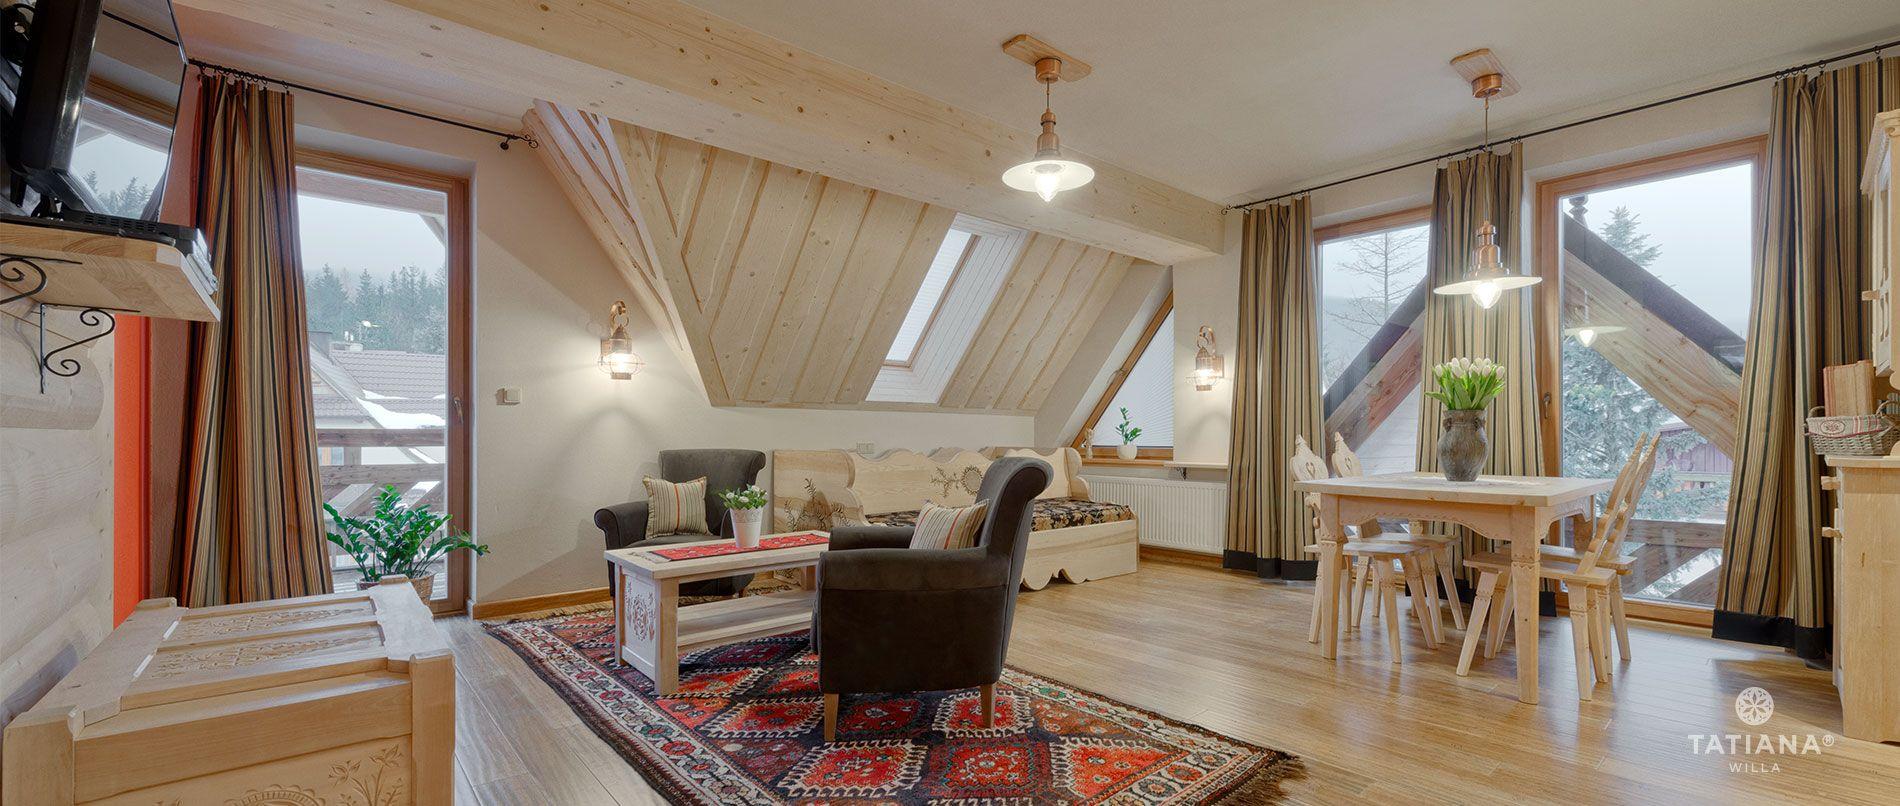 Apartament Lux 16- salon